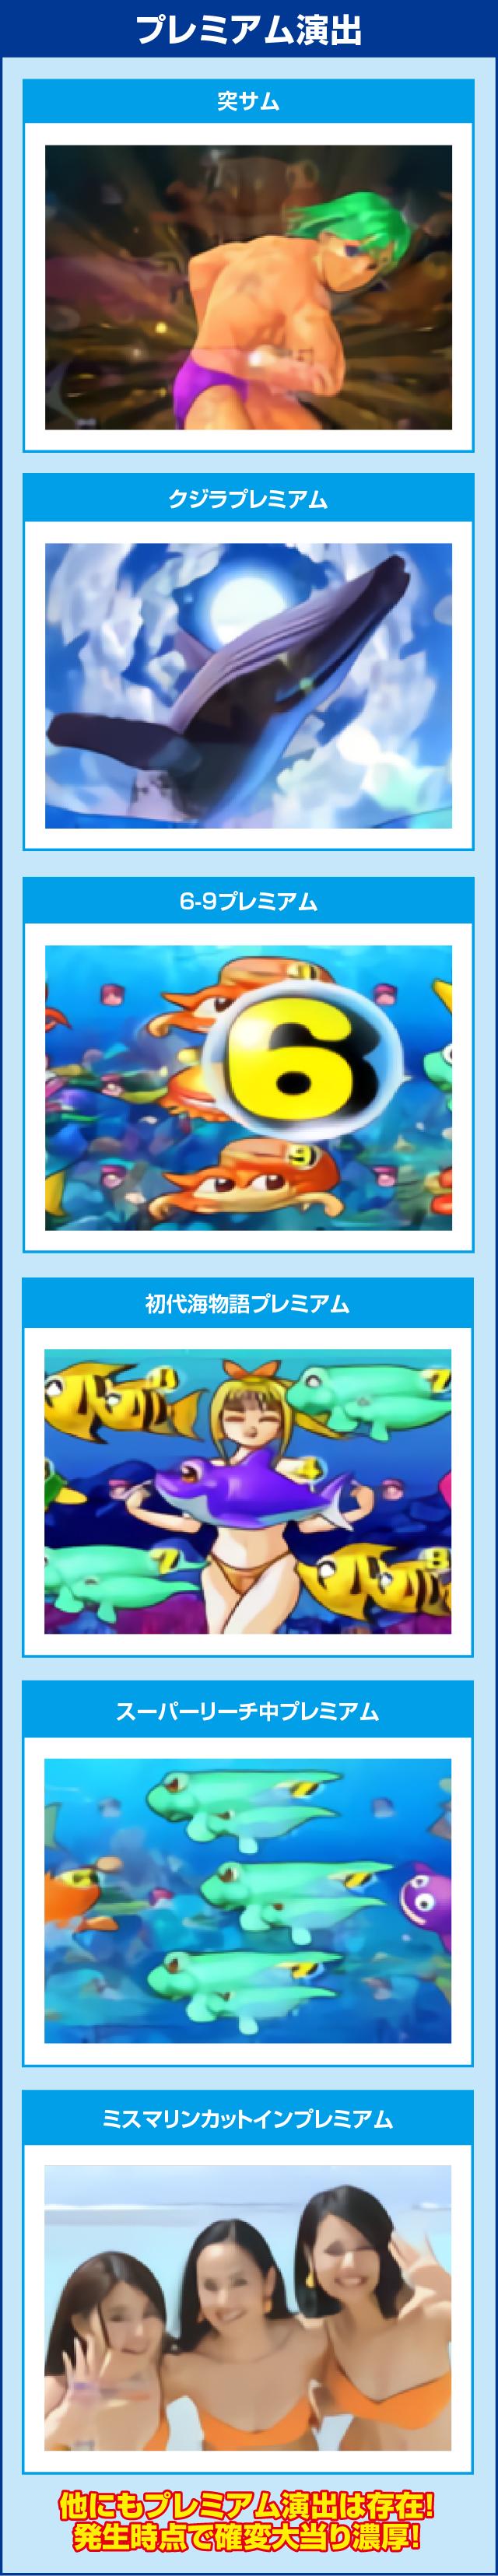 CRスーパー海物語IN沖縄4MTCのピックアップポイント